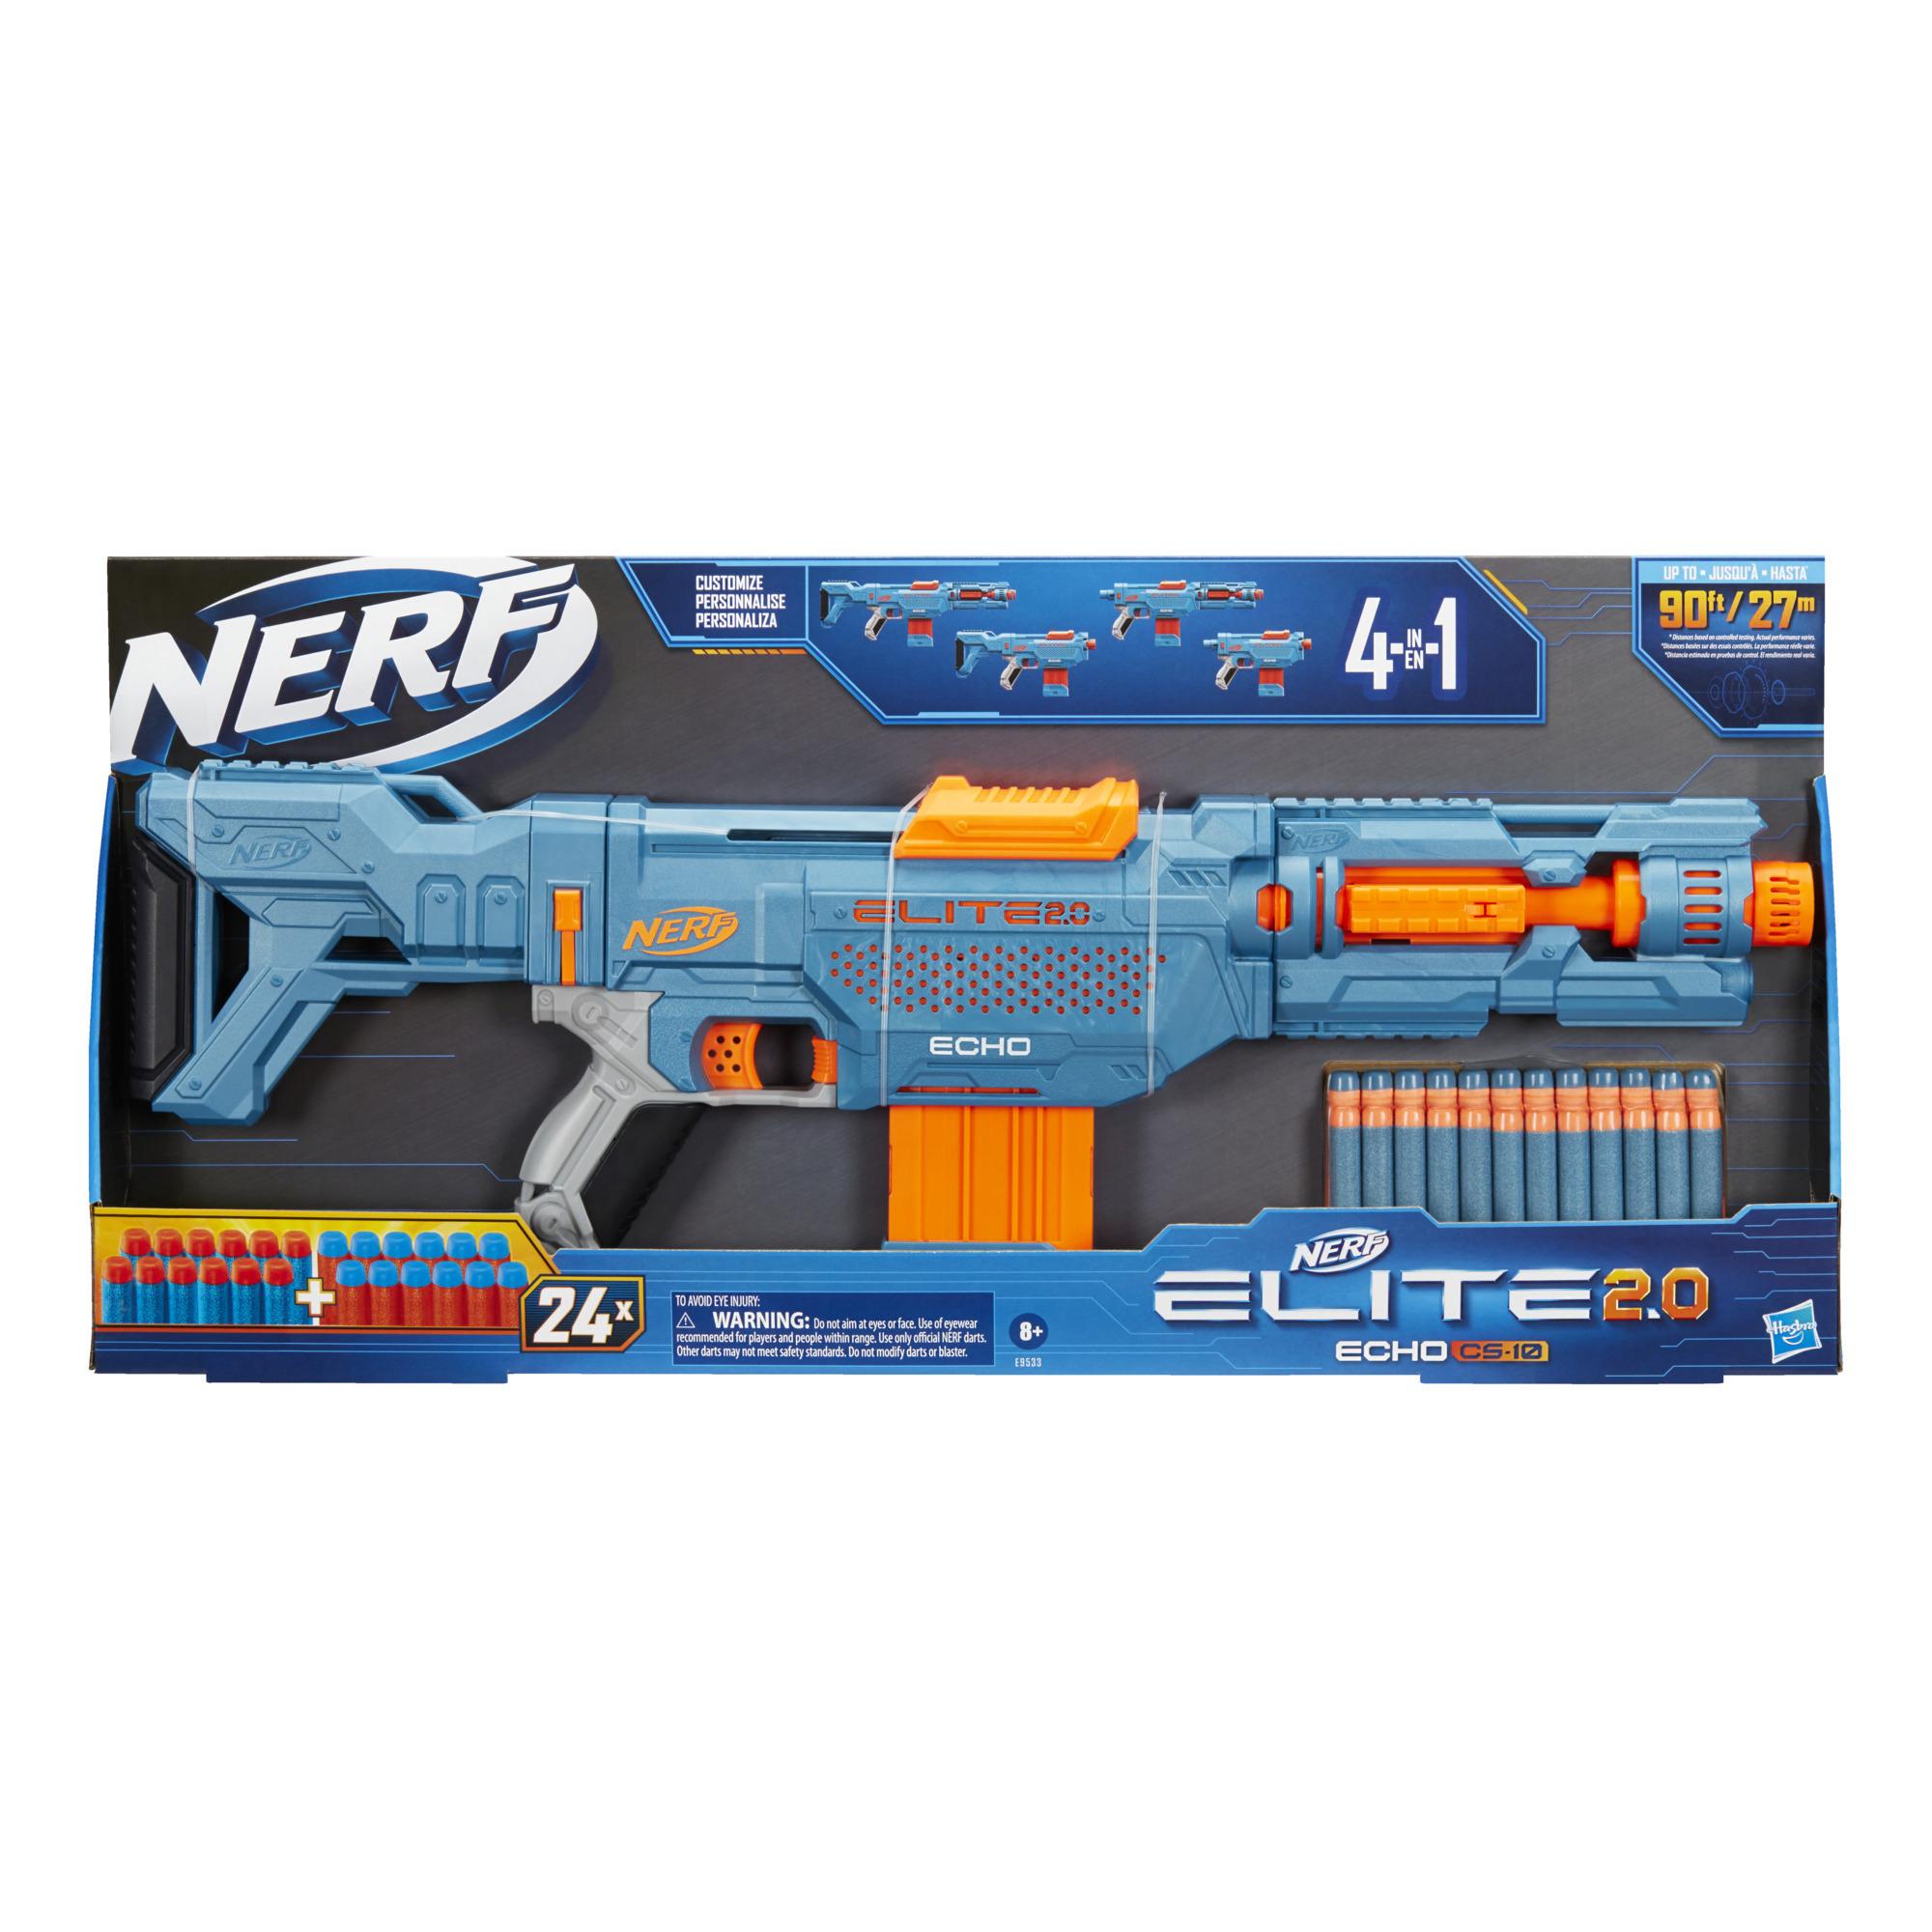 Nerf Elite 2.0 - Echo CS-10 (blaster con caricatore a clip da 10 dardi e 24 dardi inclusi).